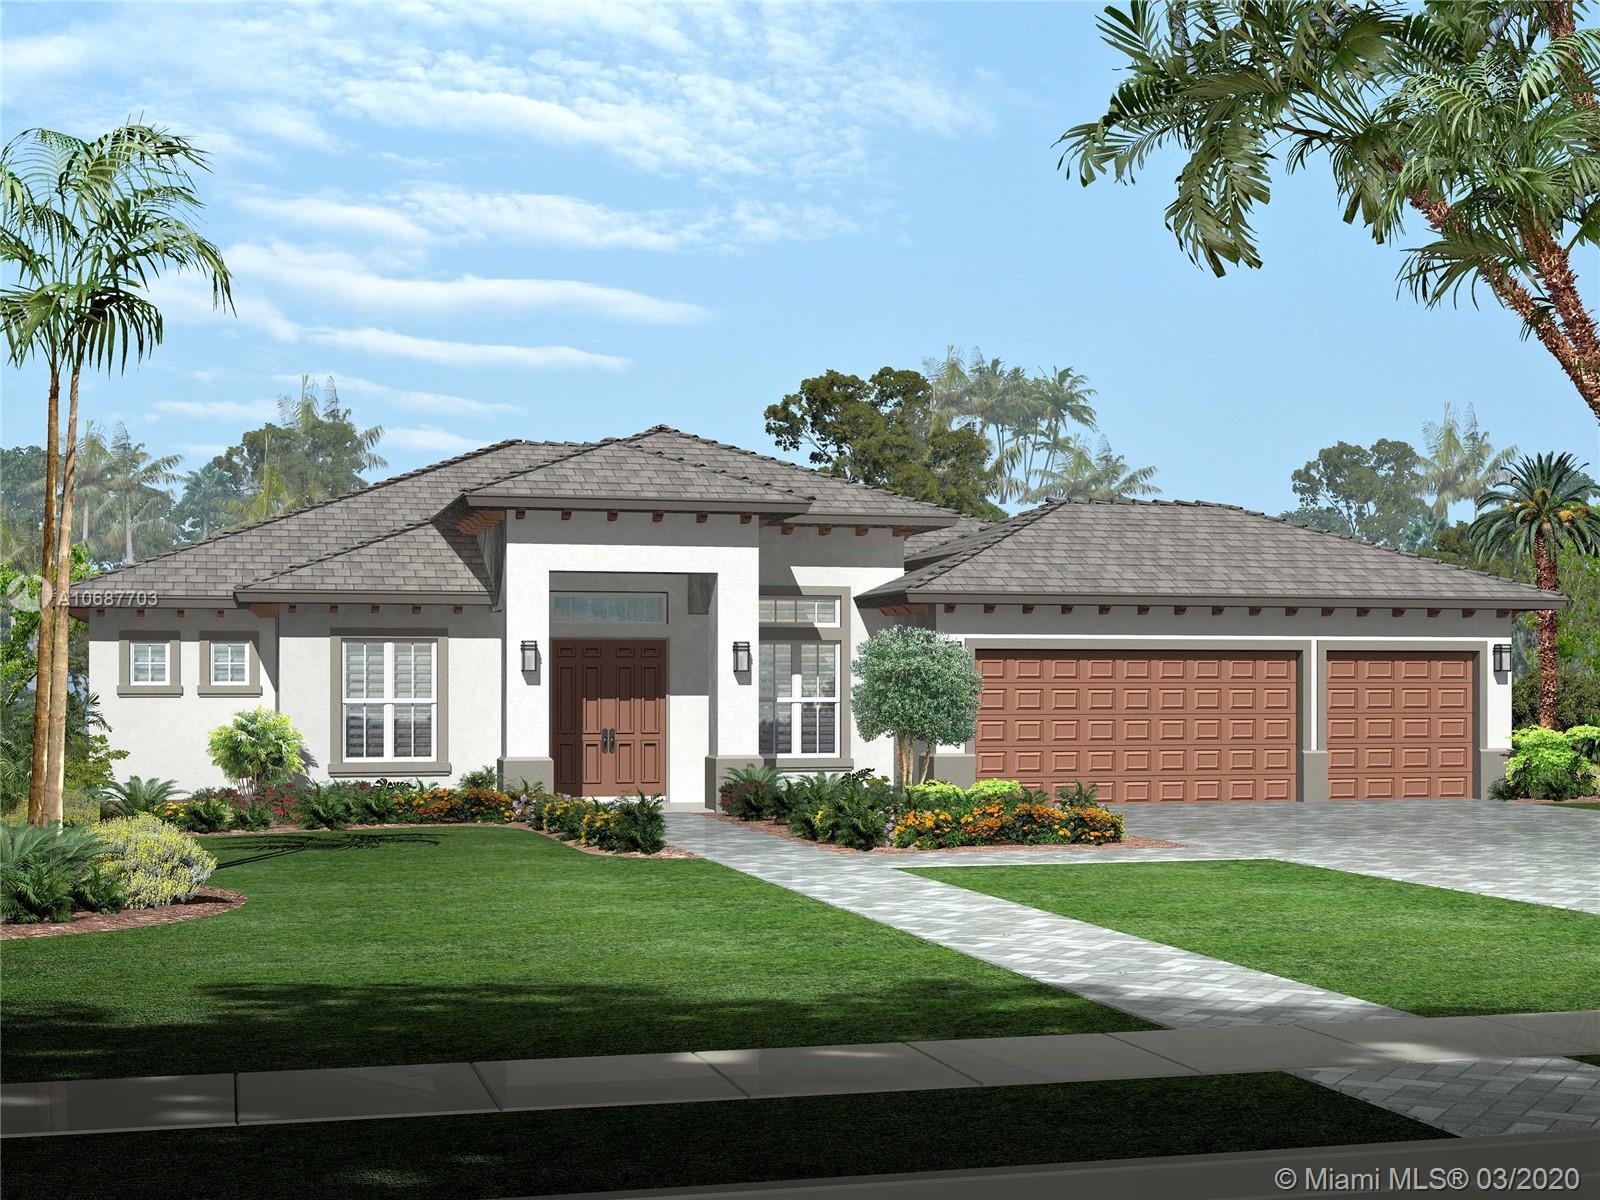 7424 Moorhen Ter, Lake Worth, FL 33463 - Lake Worth, FL real estate listing